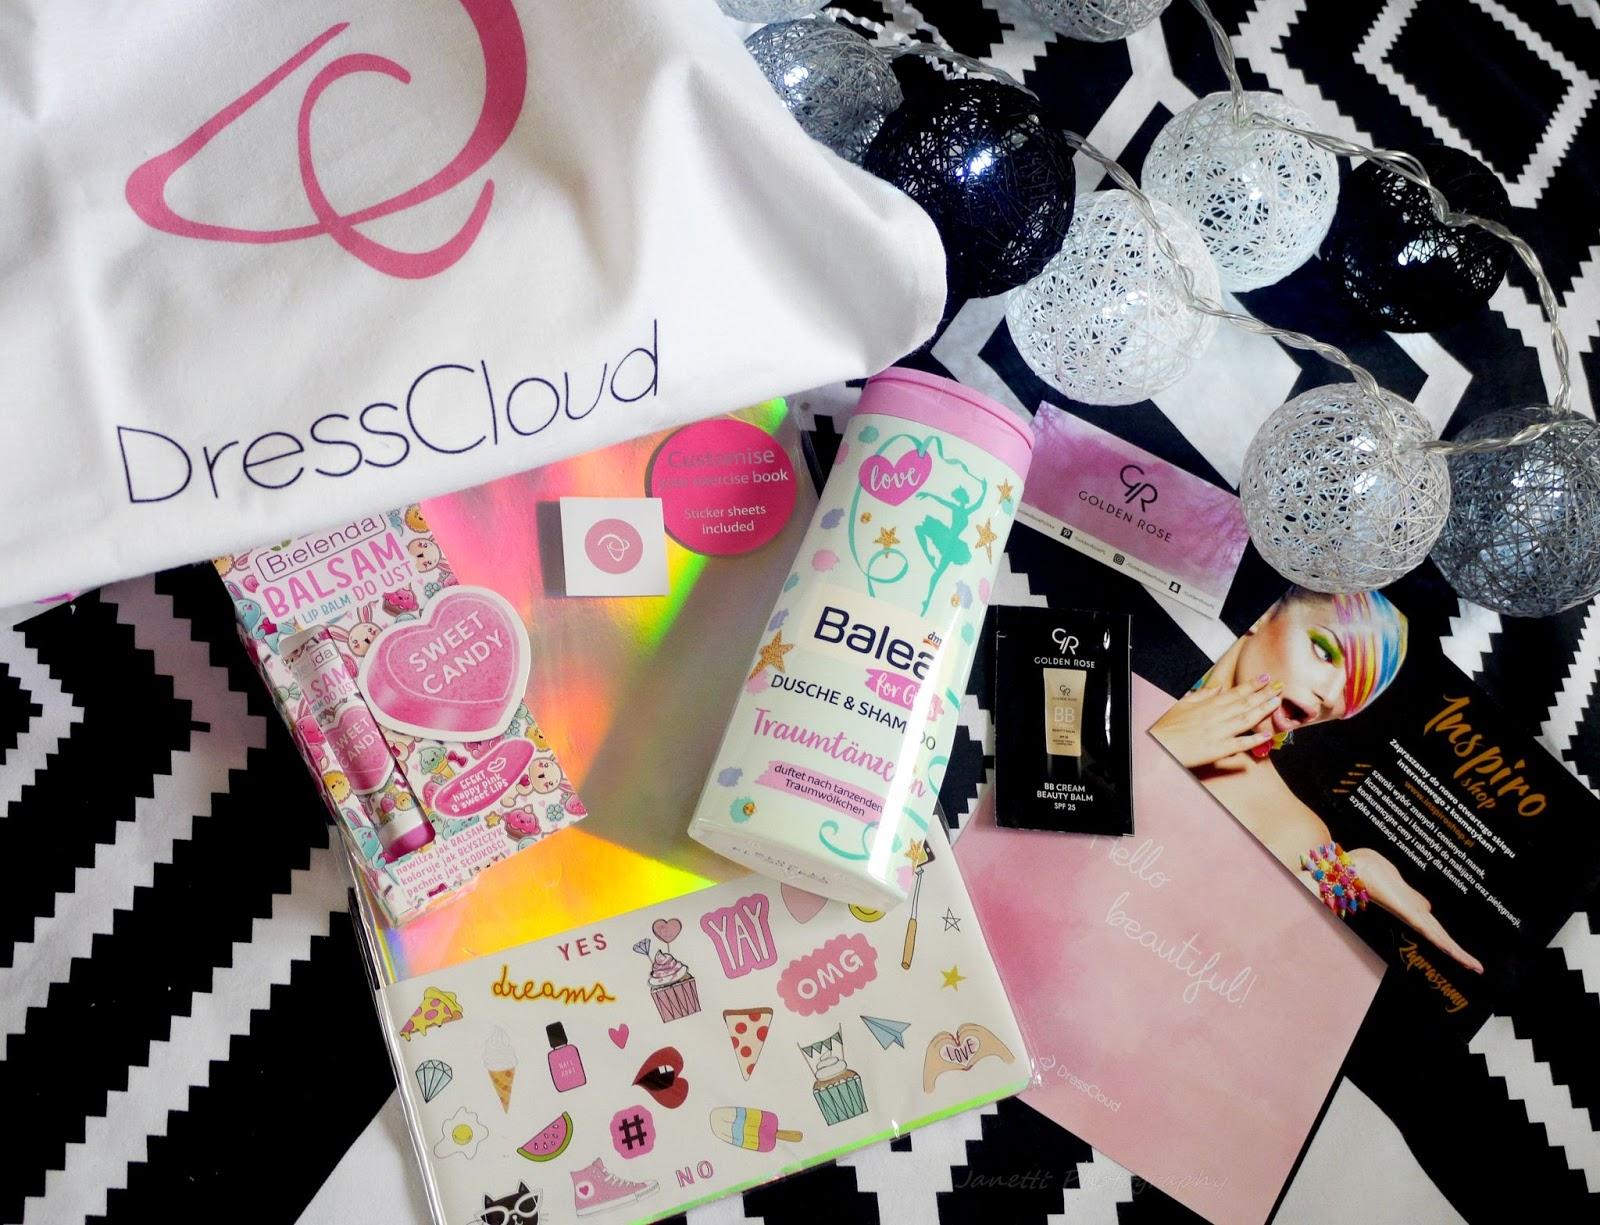 DressCloud SWOP #1021 / Konkurs na fp